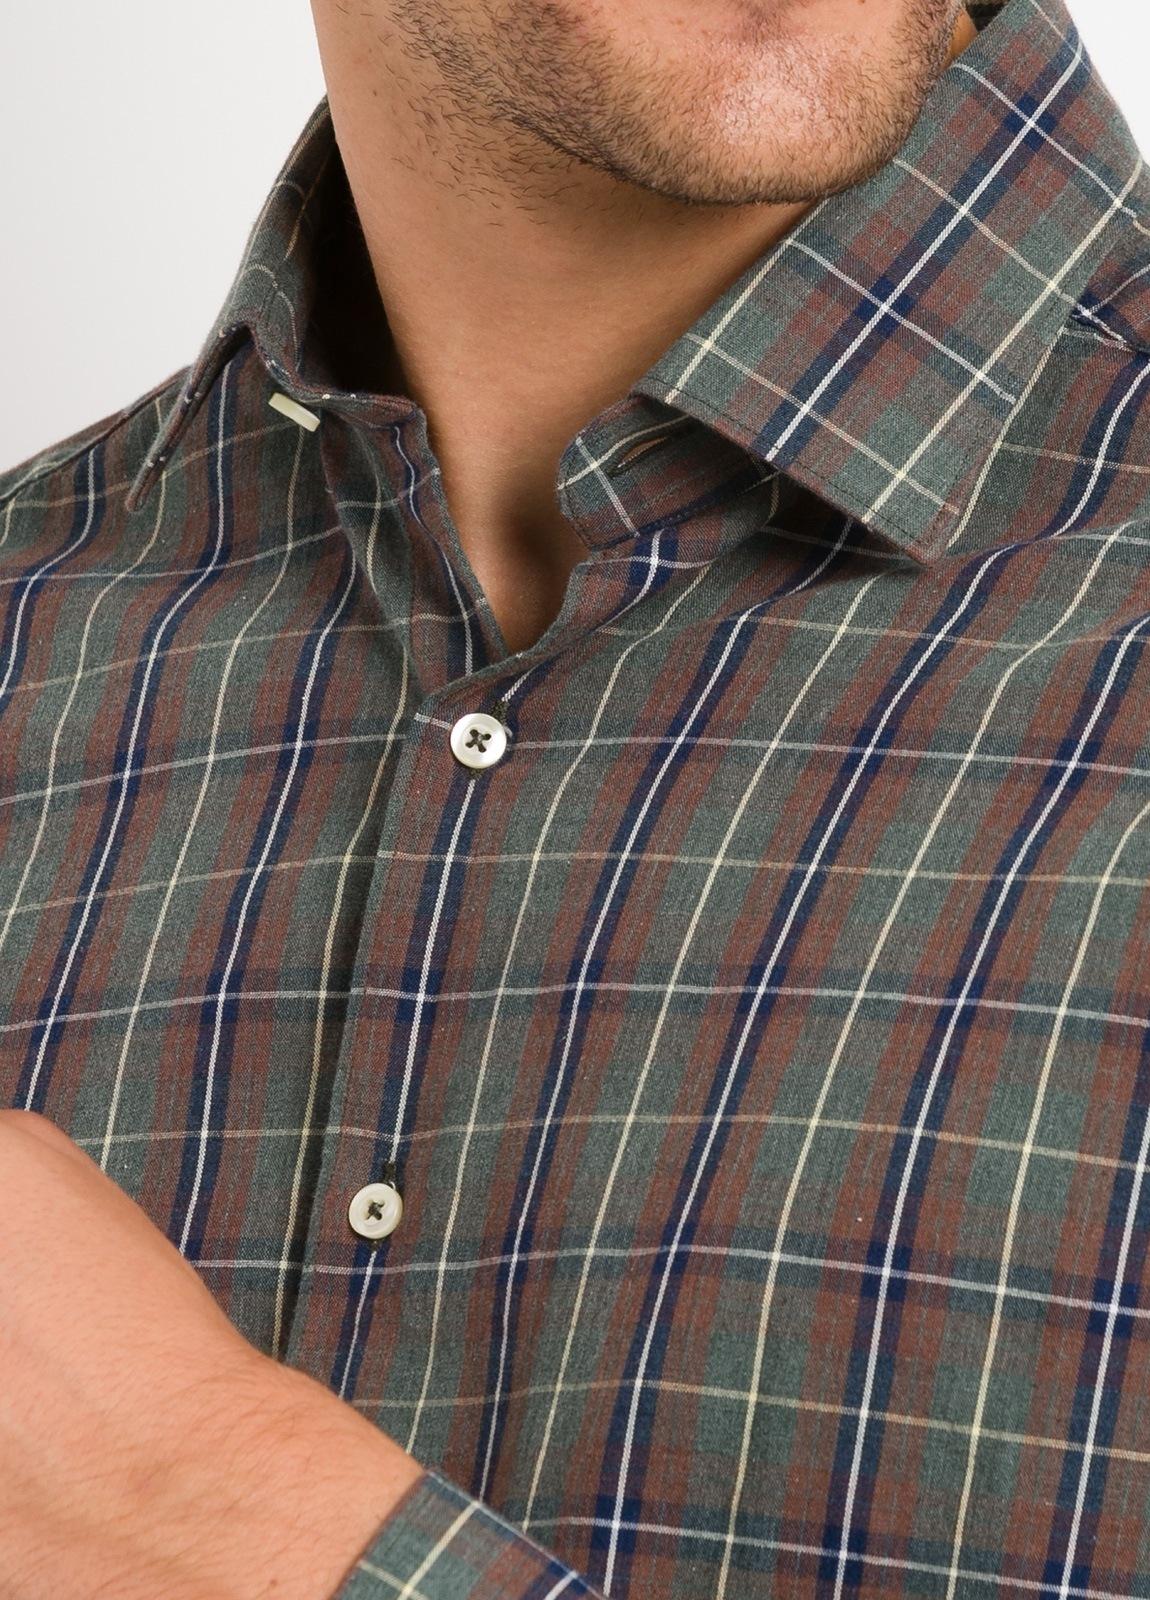 Camisa Leisure Wear REGULAR FIT modelo PORTO, cuadros gris, teja. 100% Algodón. - Ítem2